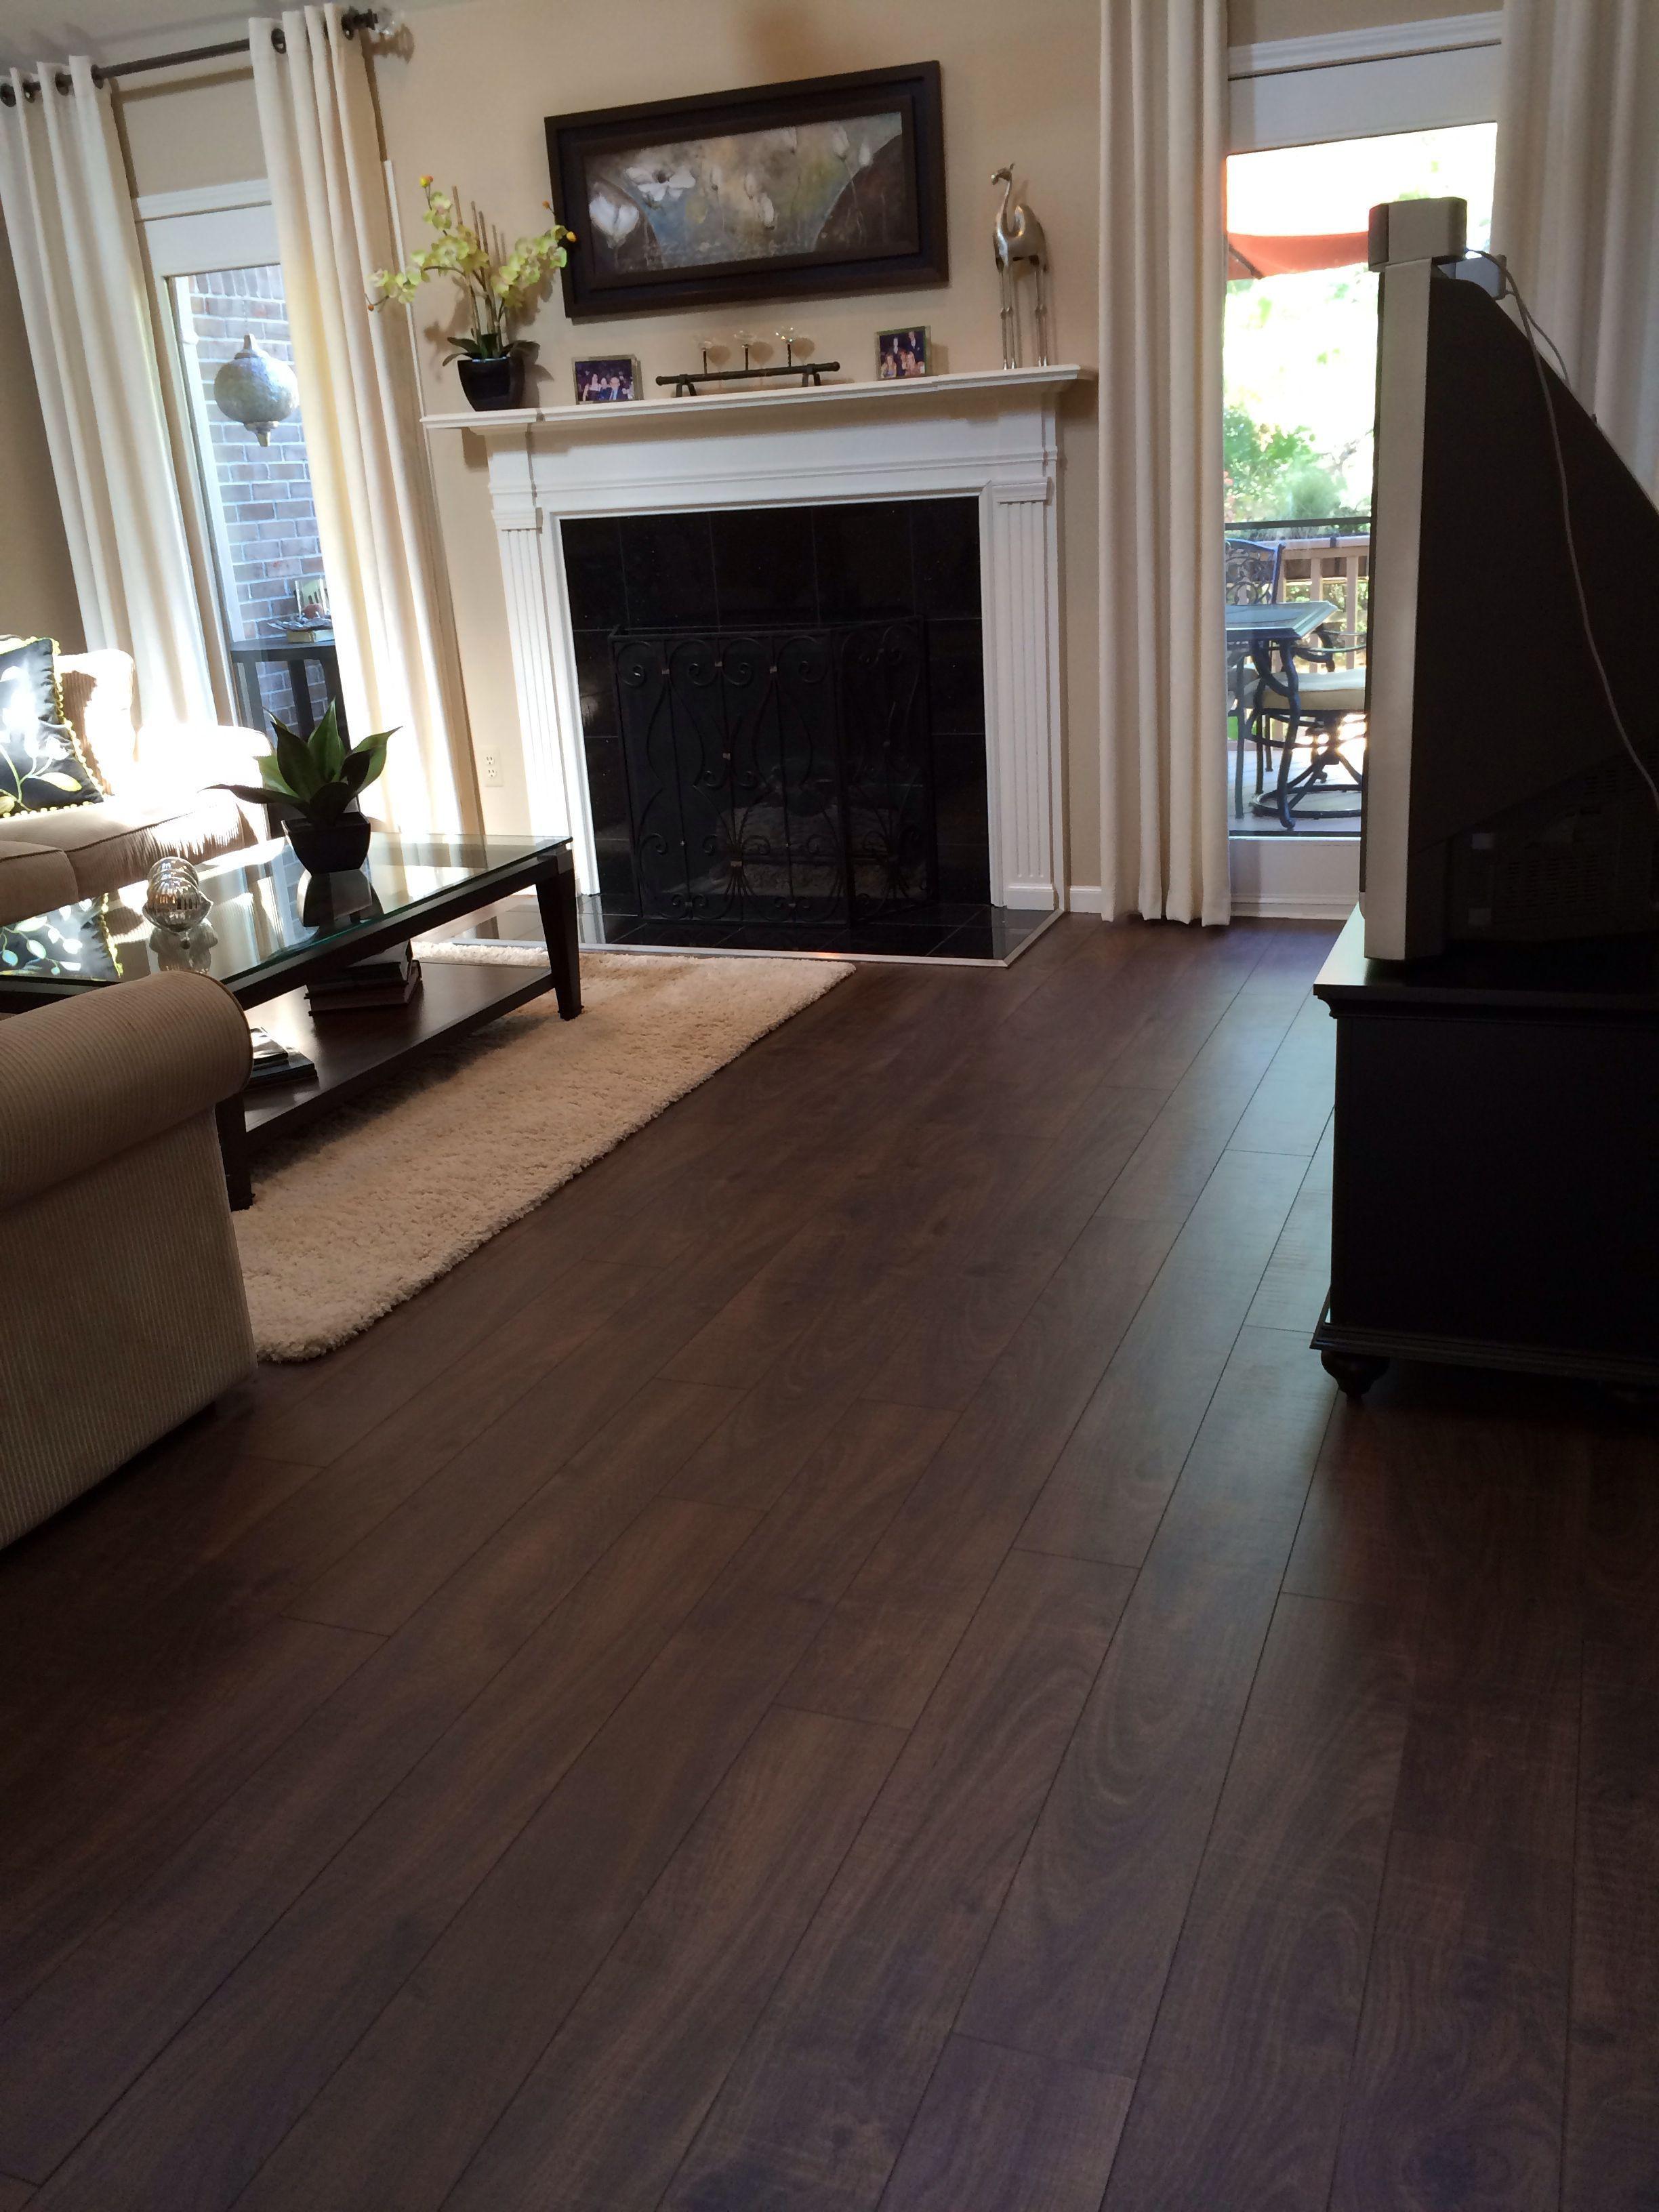 hardwood floor tile inlay of tile on wood floor floor plan ideas regarding light wood tile floors new decorating an open floor plan living room awesome design plan 0d